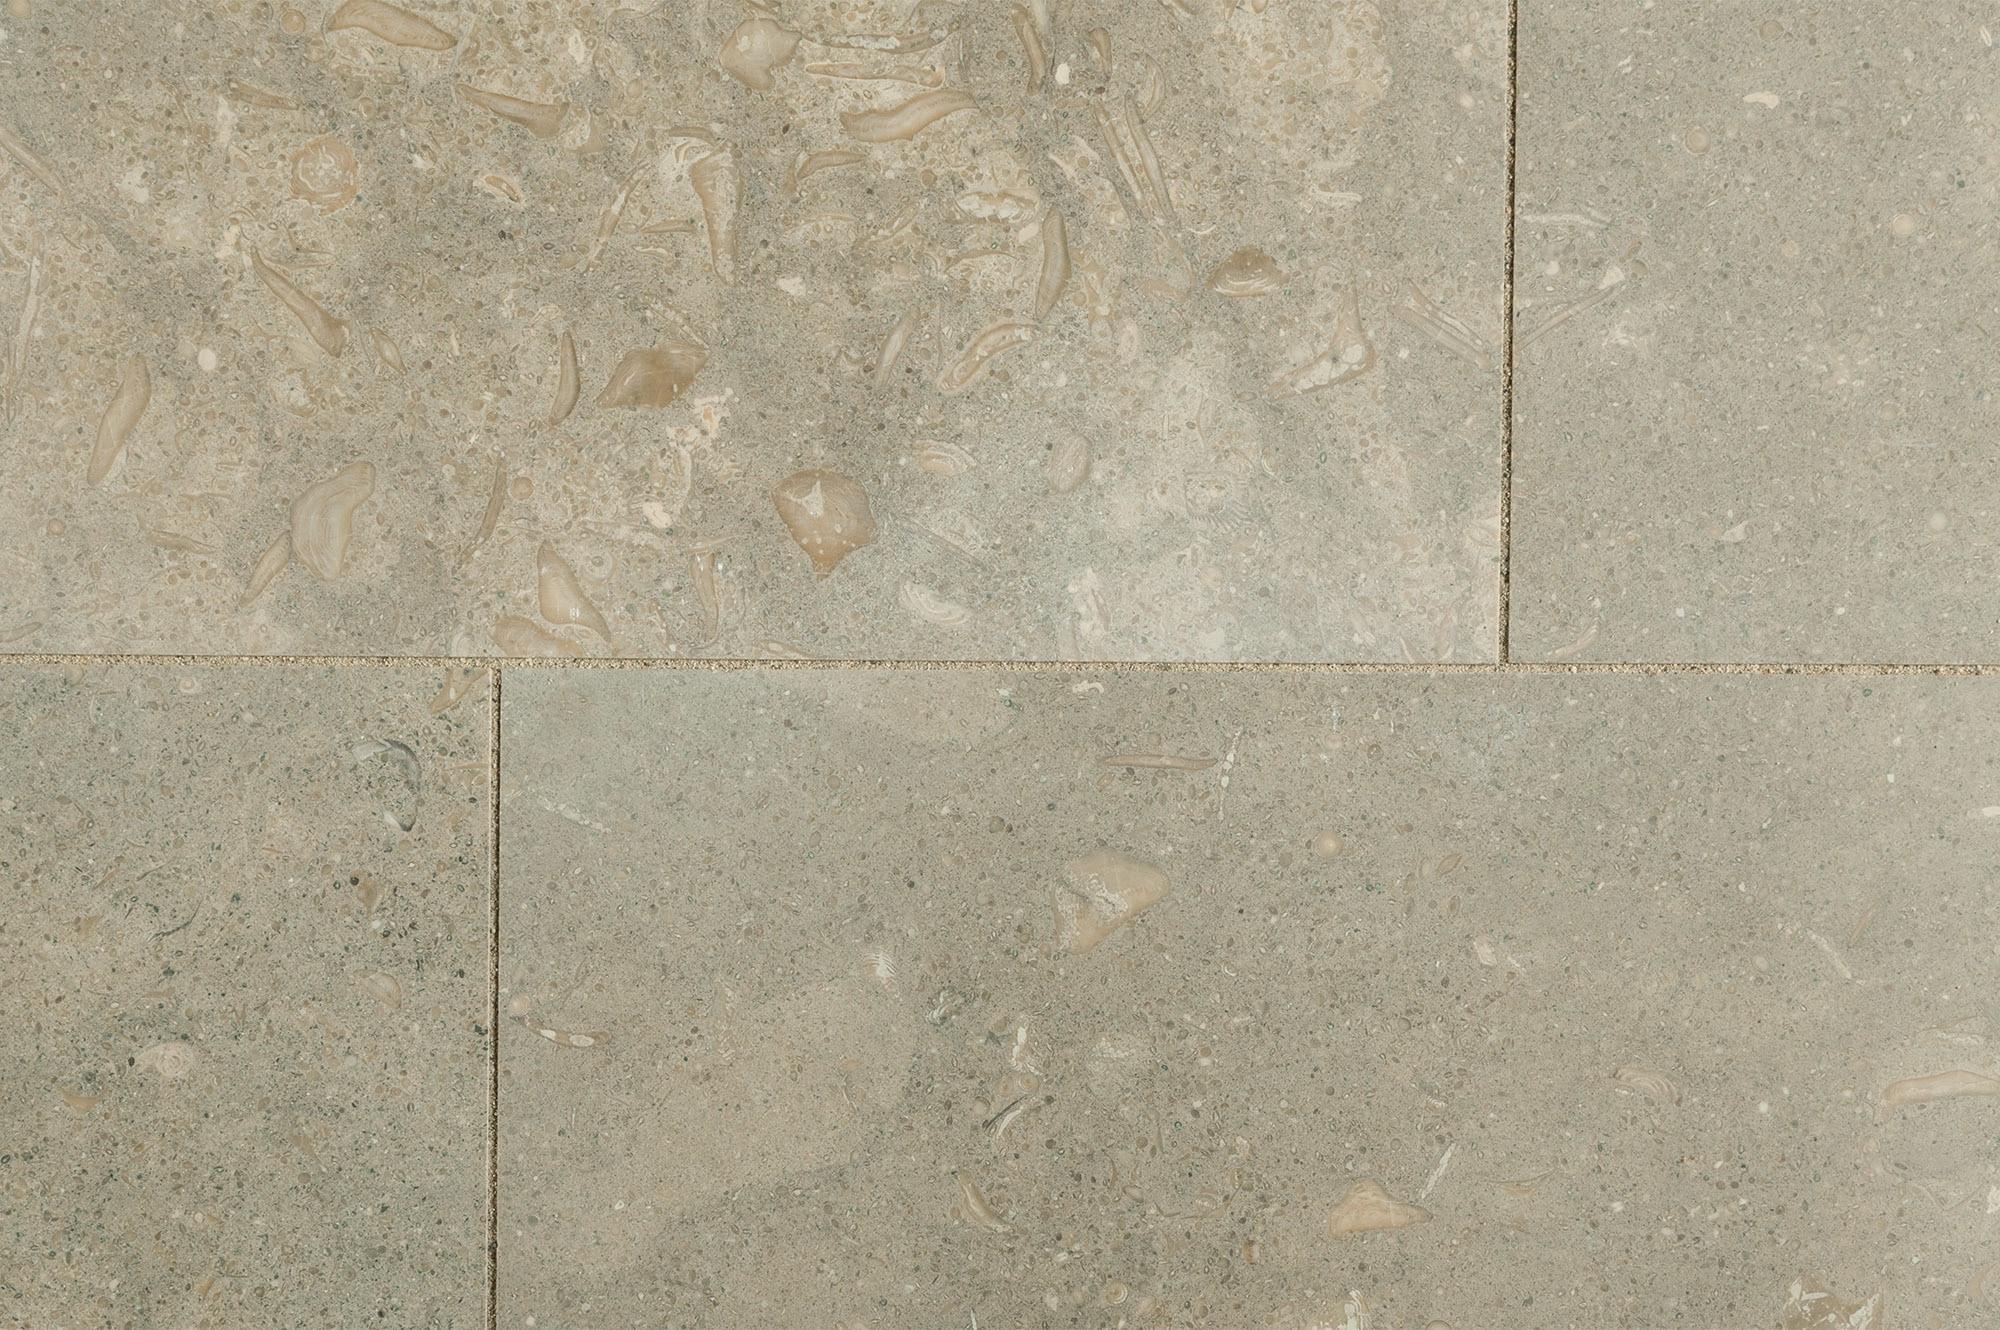 Free samples kesir limestone tile sea grass honed 18x18 dailygadgetfo Choice Image